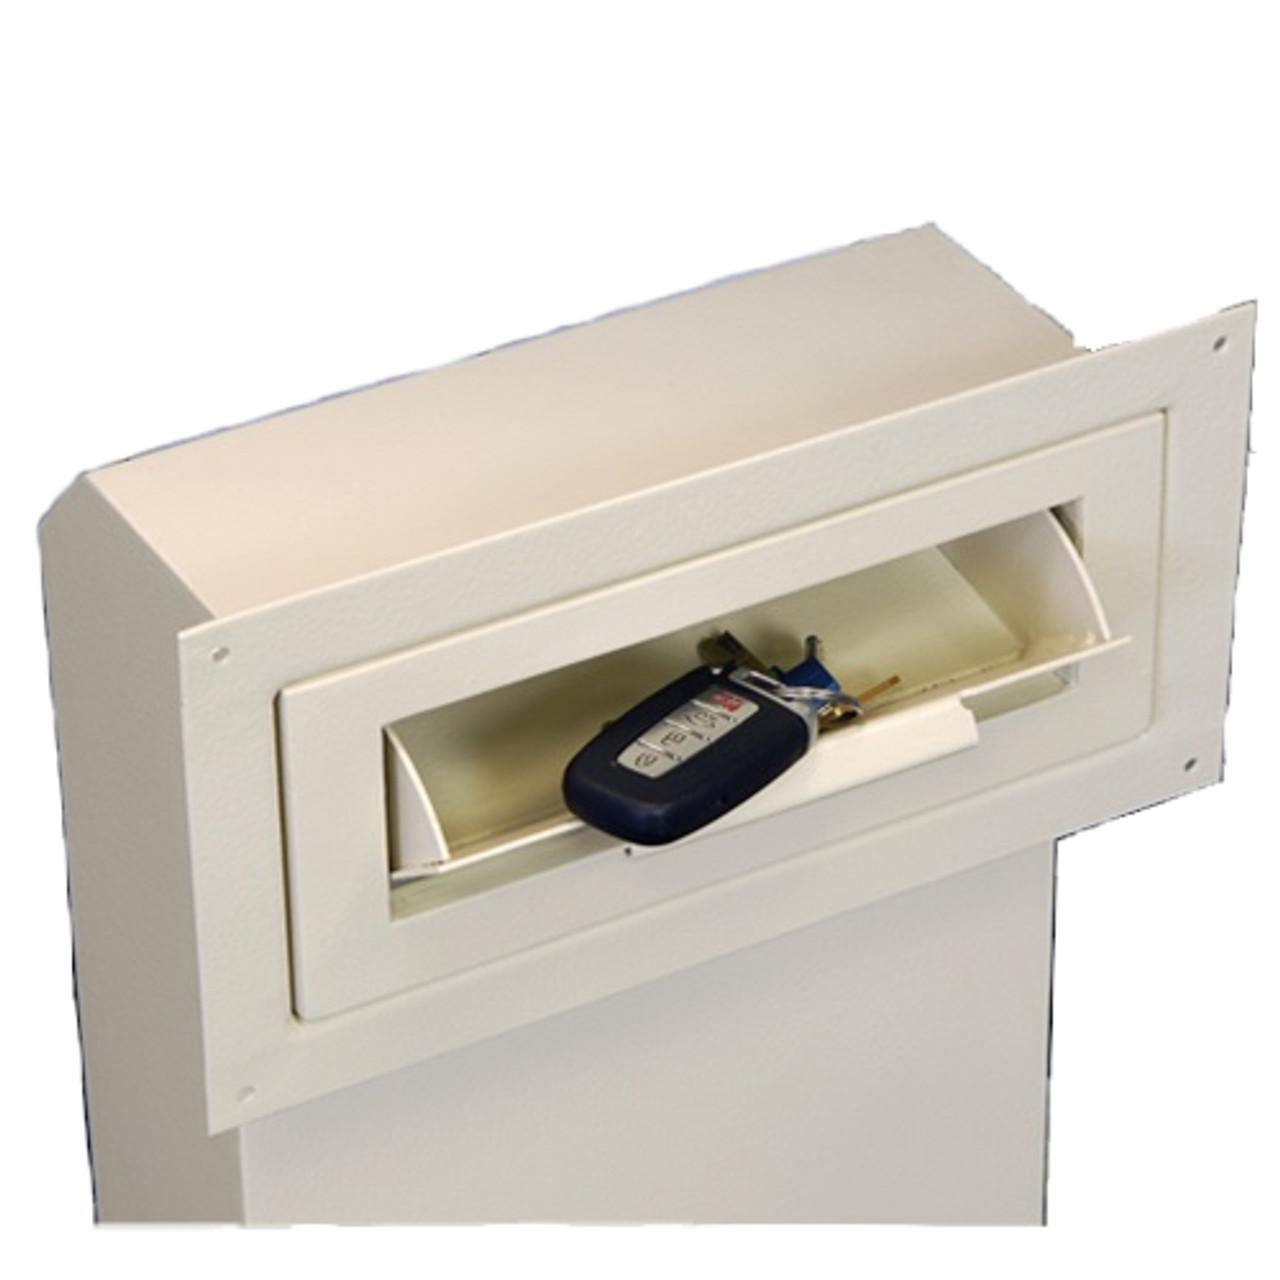 Through The Door Drop Slot With Receptacle Locking